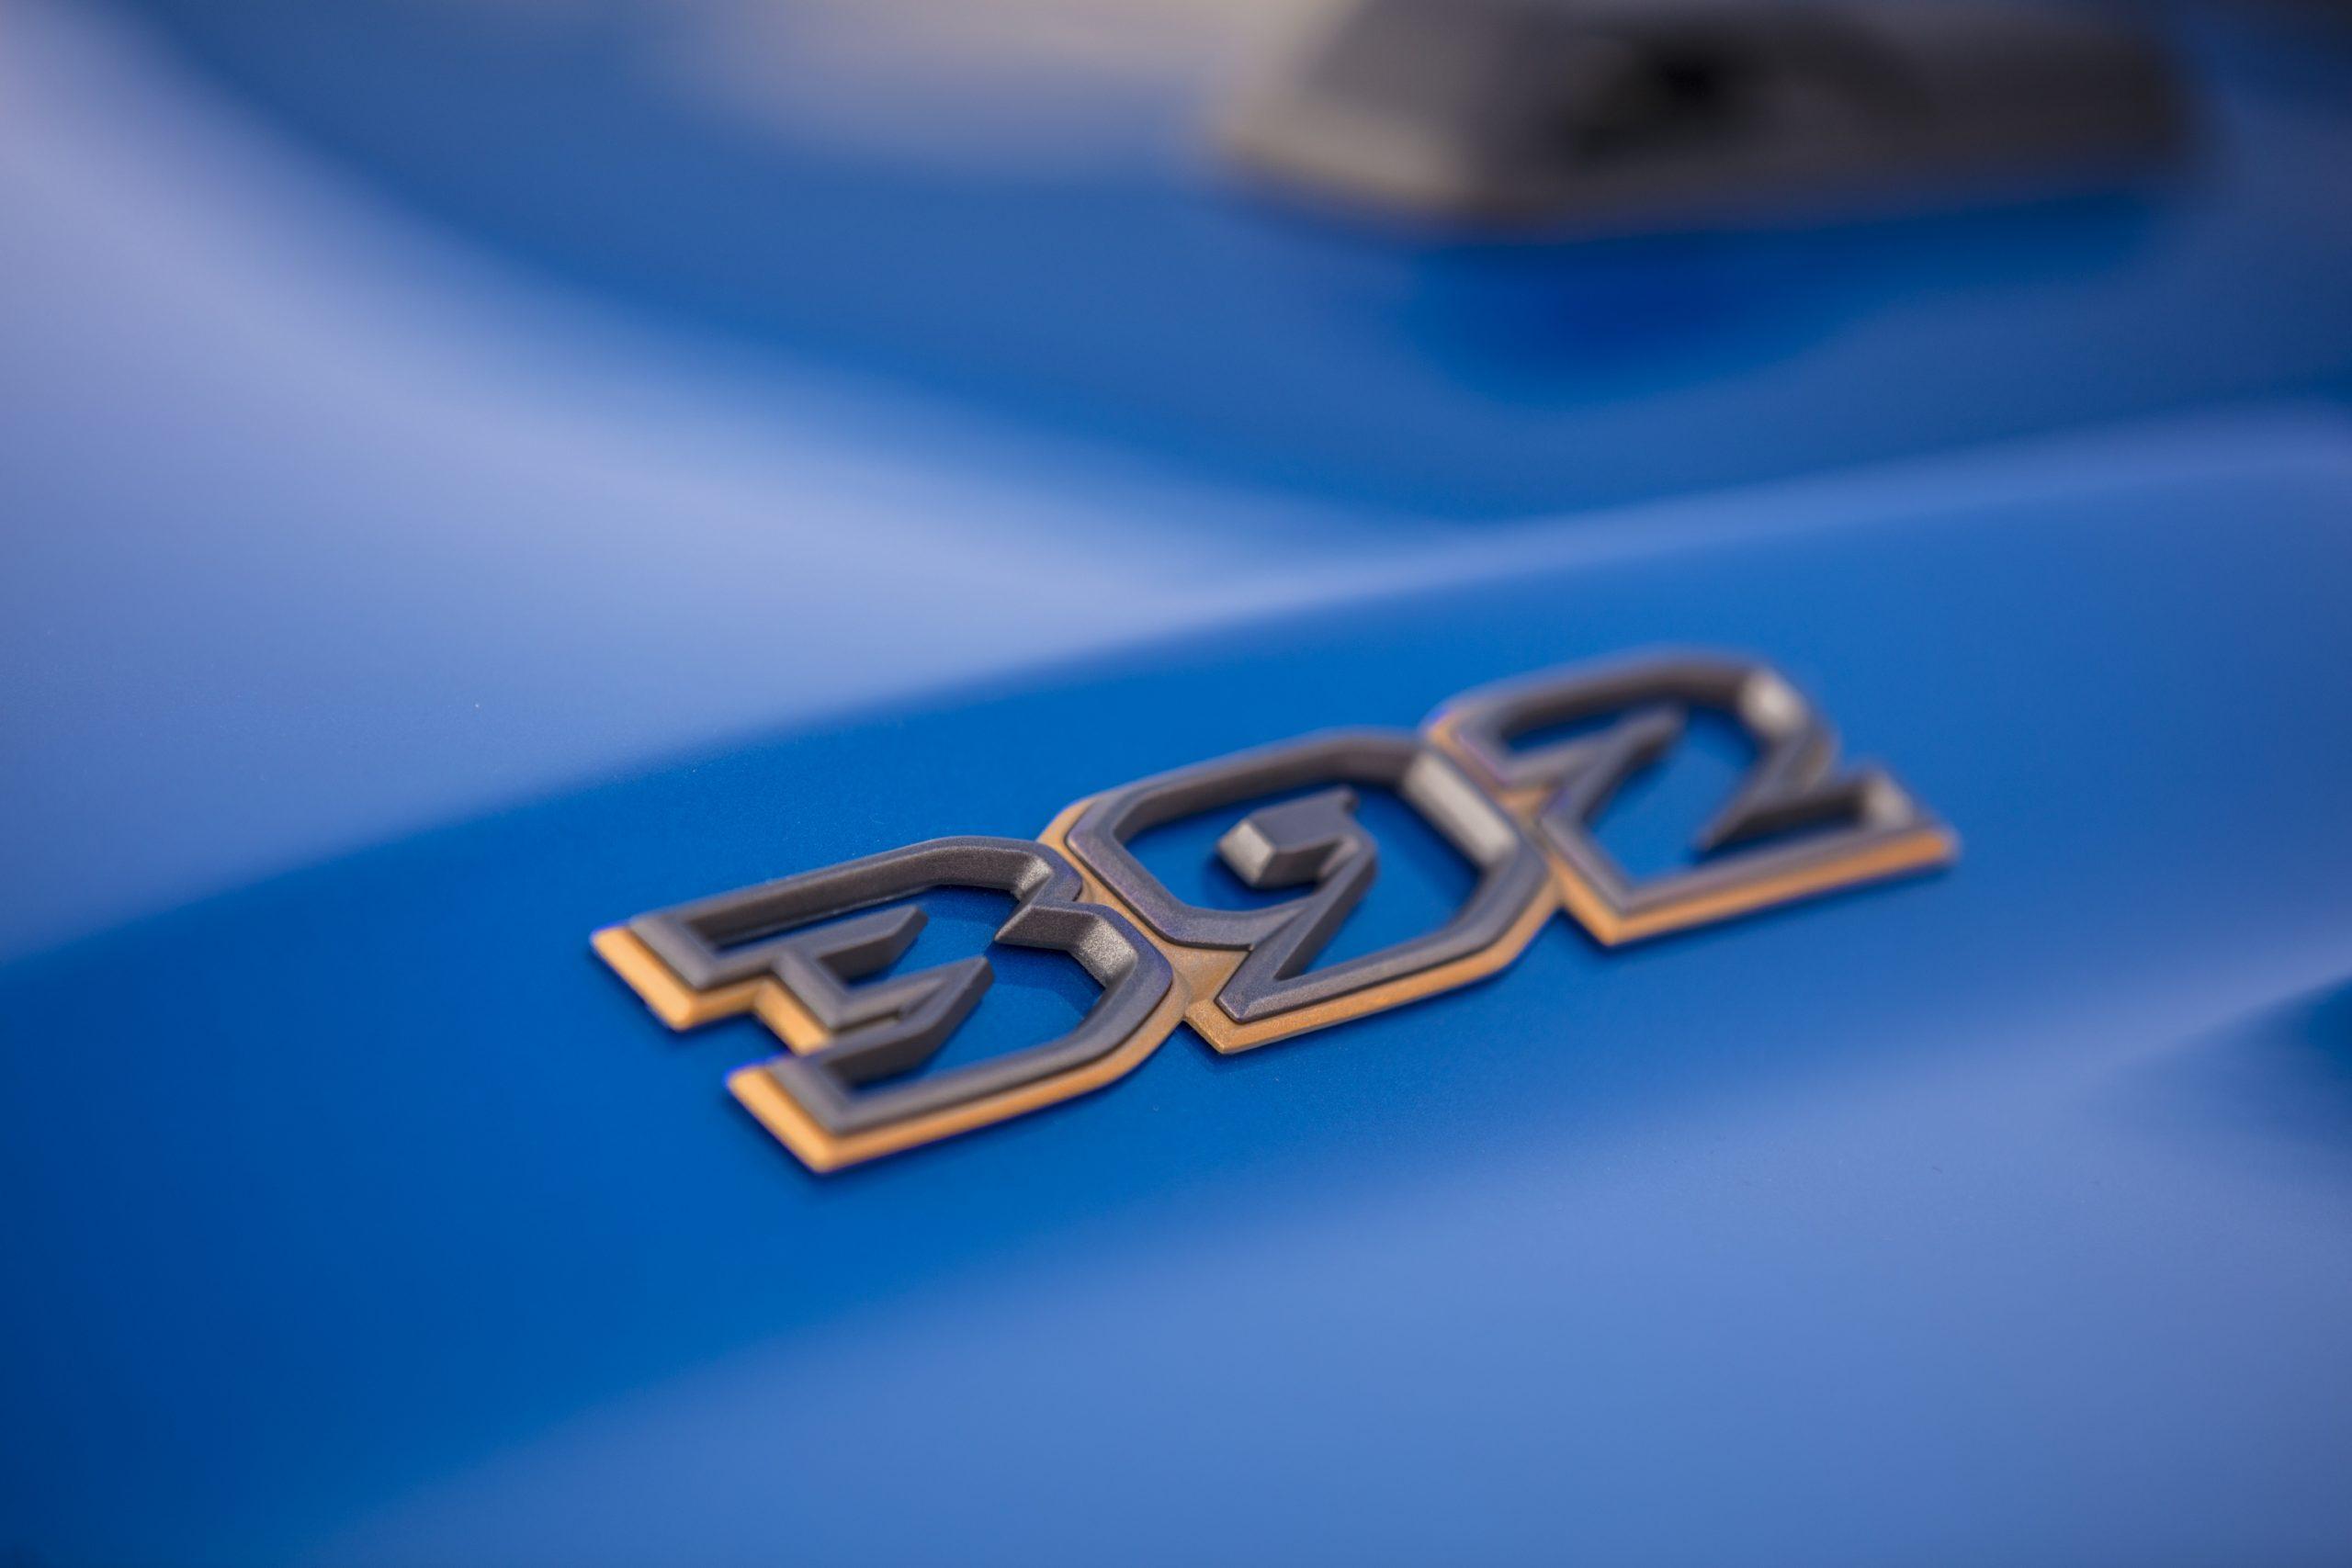 2021 Jeep Wrangler Rubicon 392 hood badge